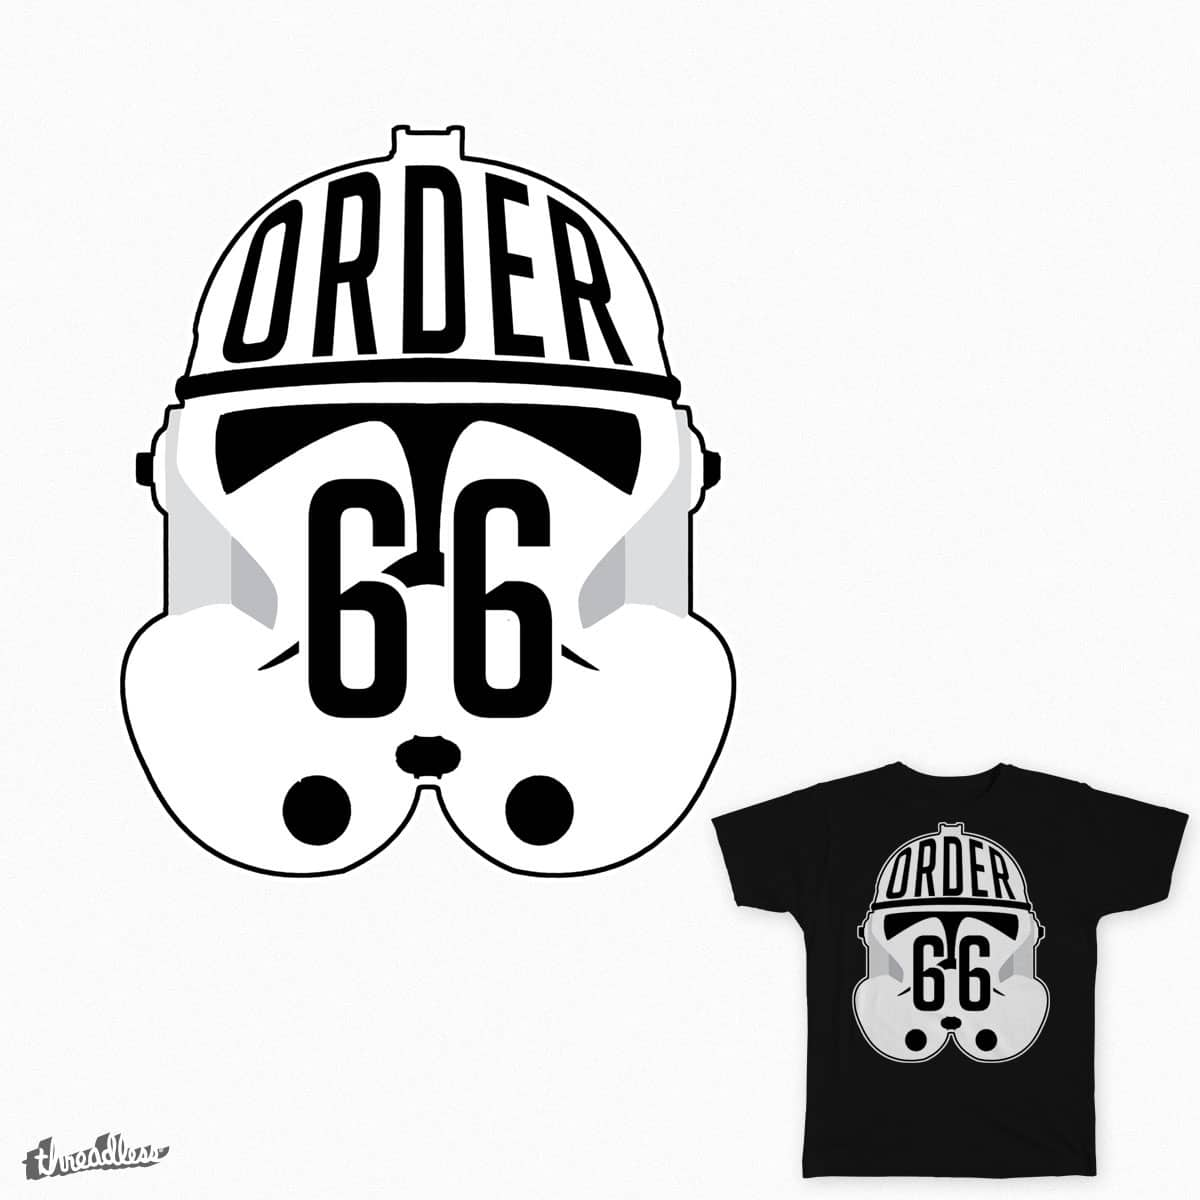 Order 66 by EmpireSquared on Threadless